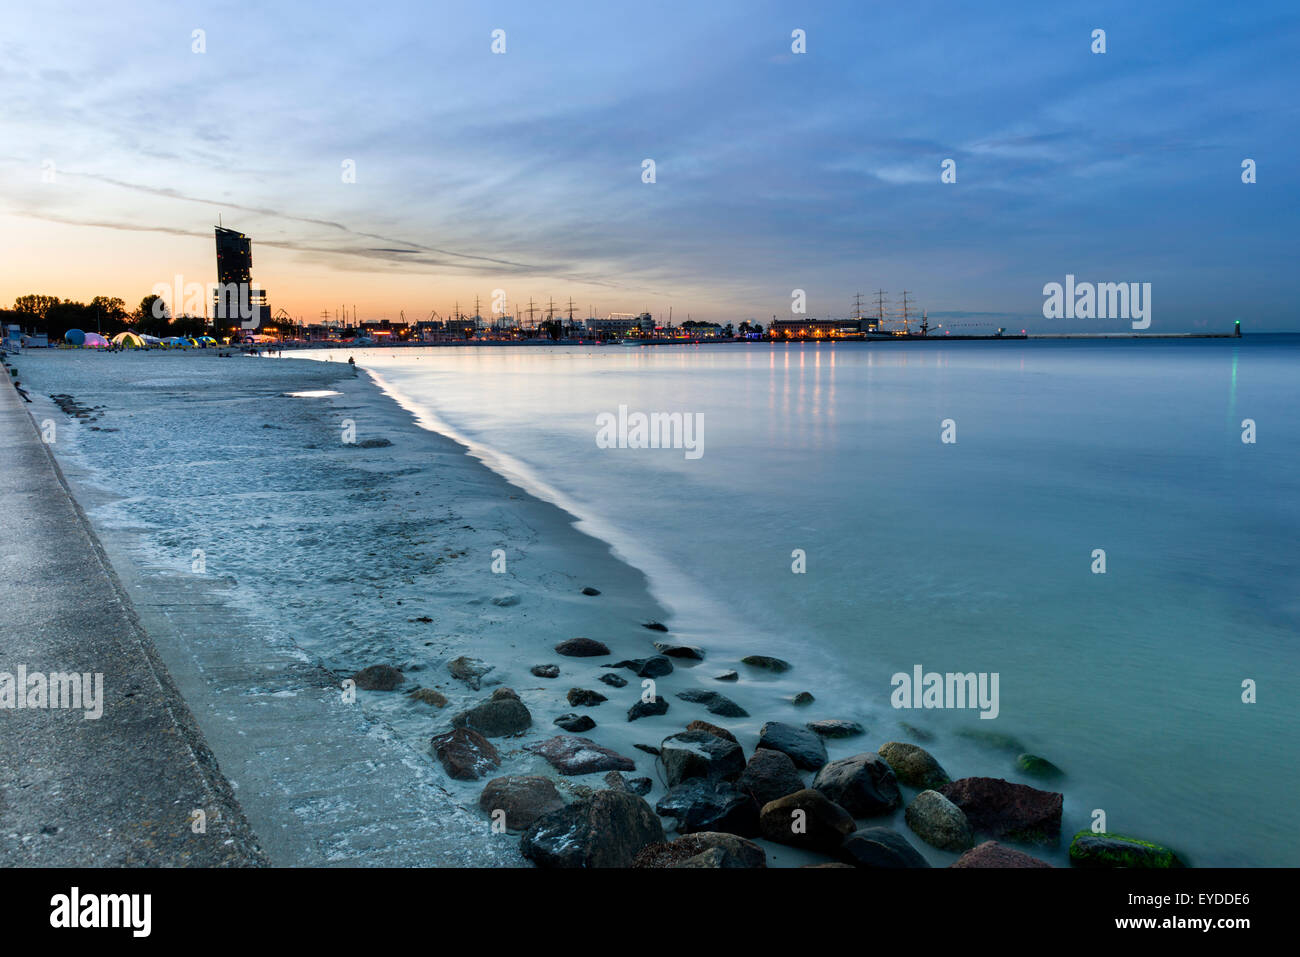 Marina in Gdynia city on the Baltic seaside Stock Photo